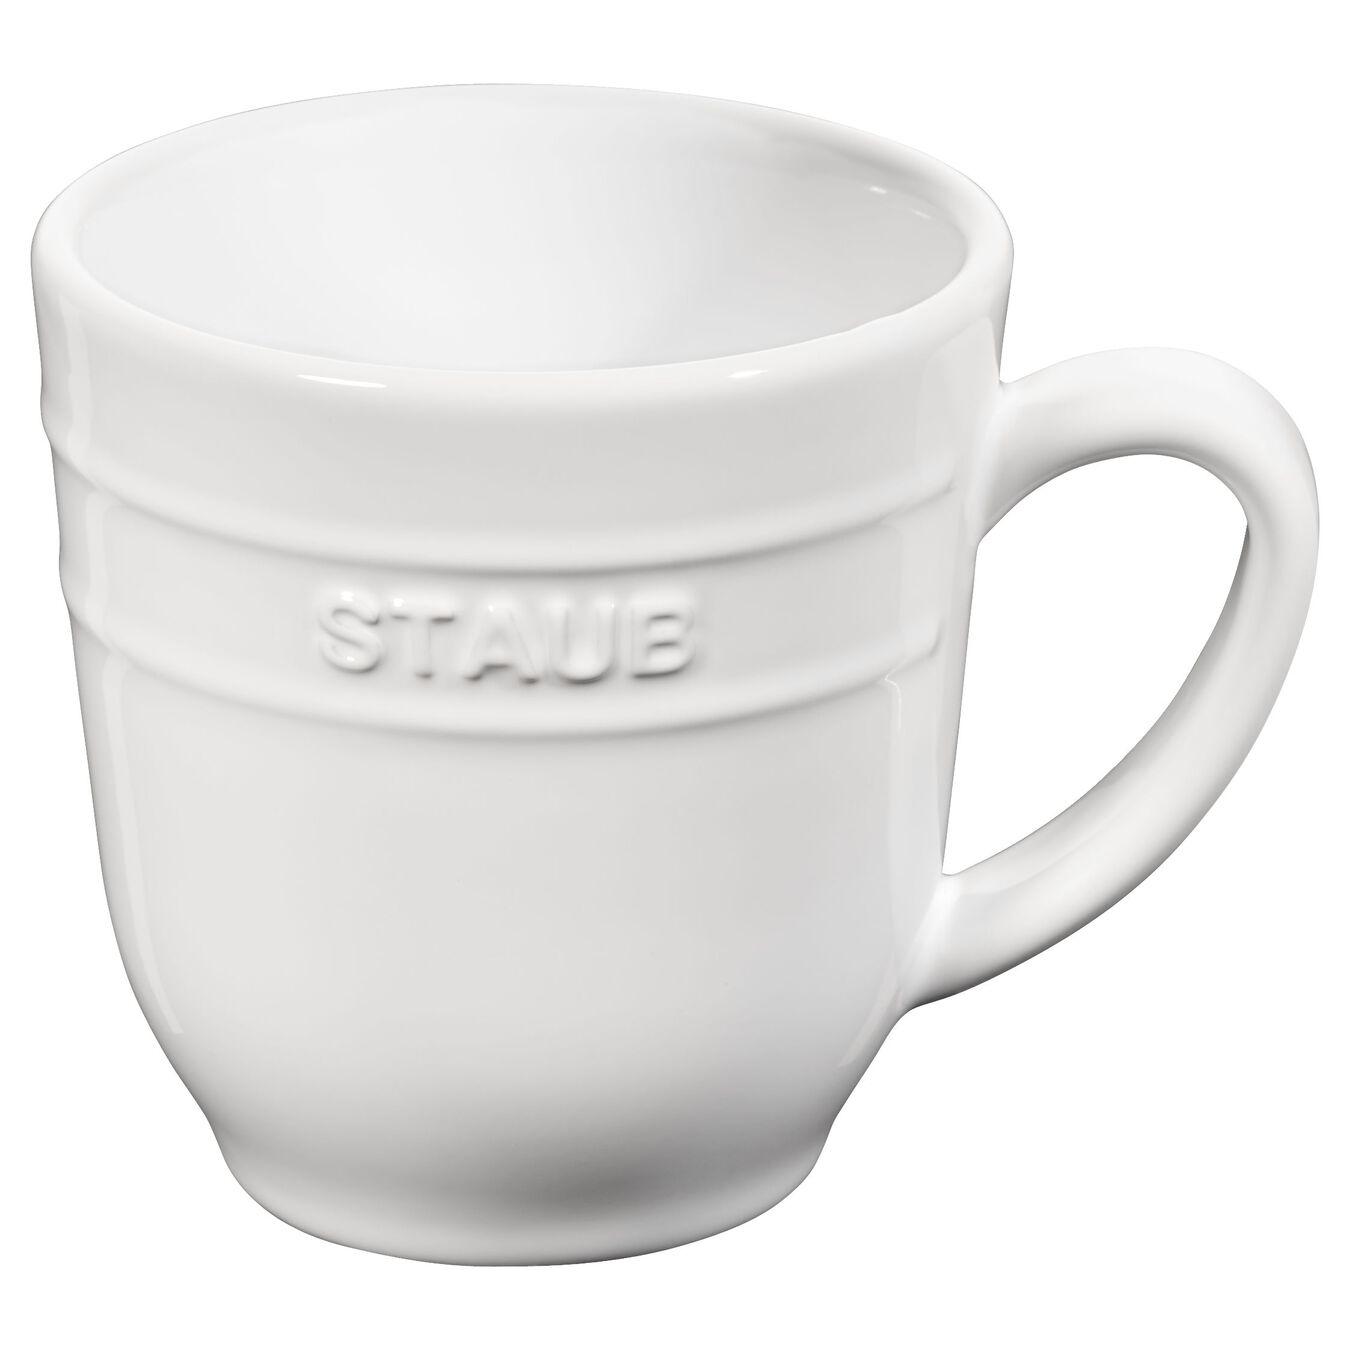 Ceramic round Mug, Pure-White,,large 1